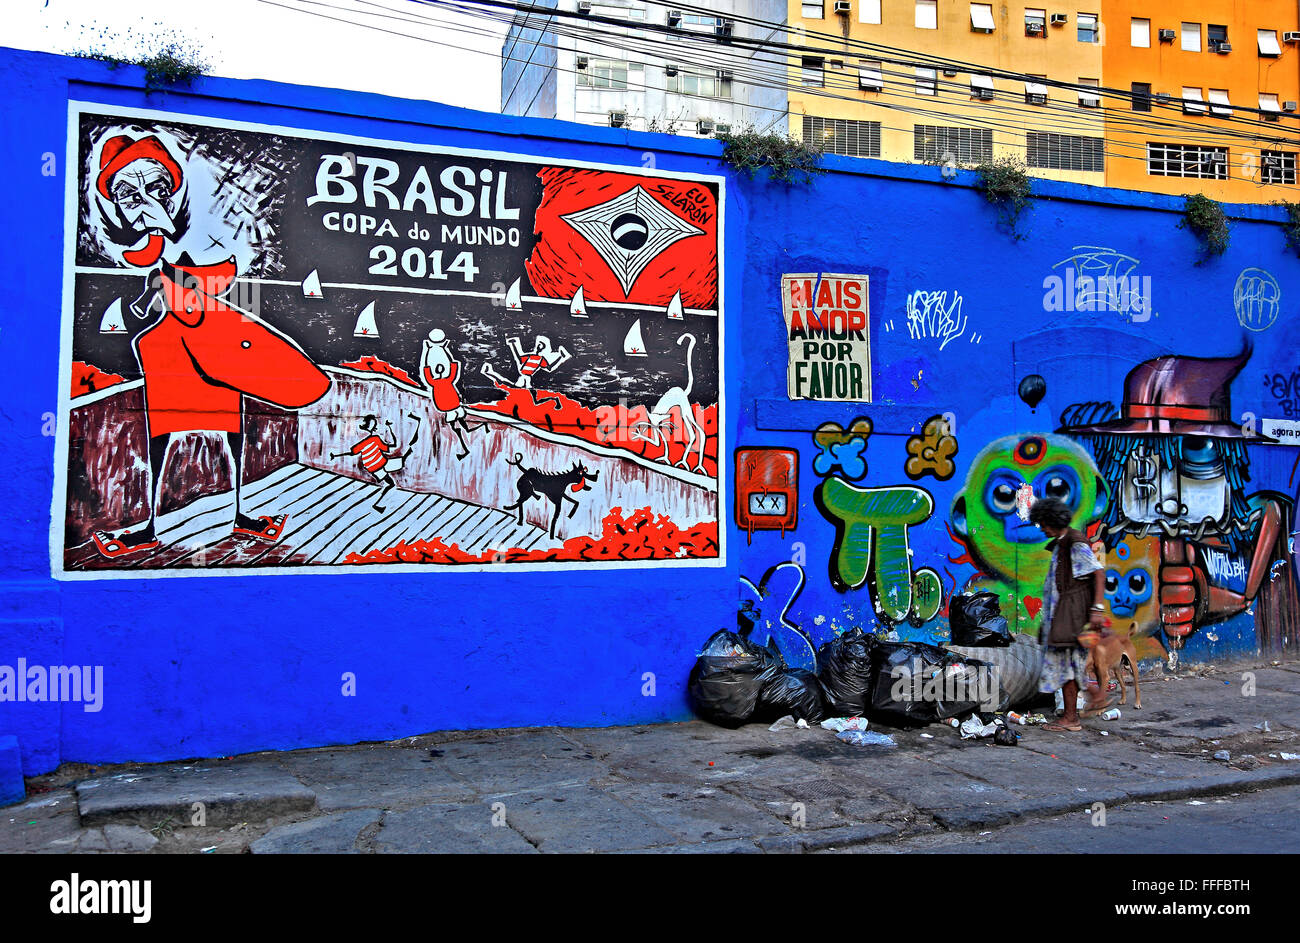 Critical billboard after the football World Cup 2014, Rio de Janeiro, Brazil - Stock Image